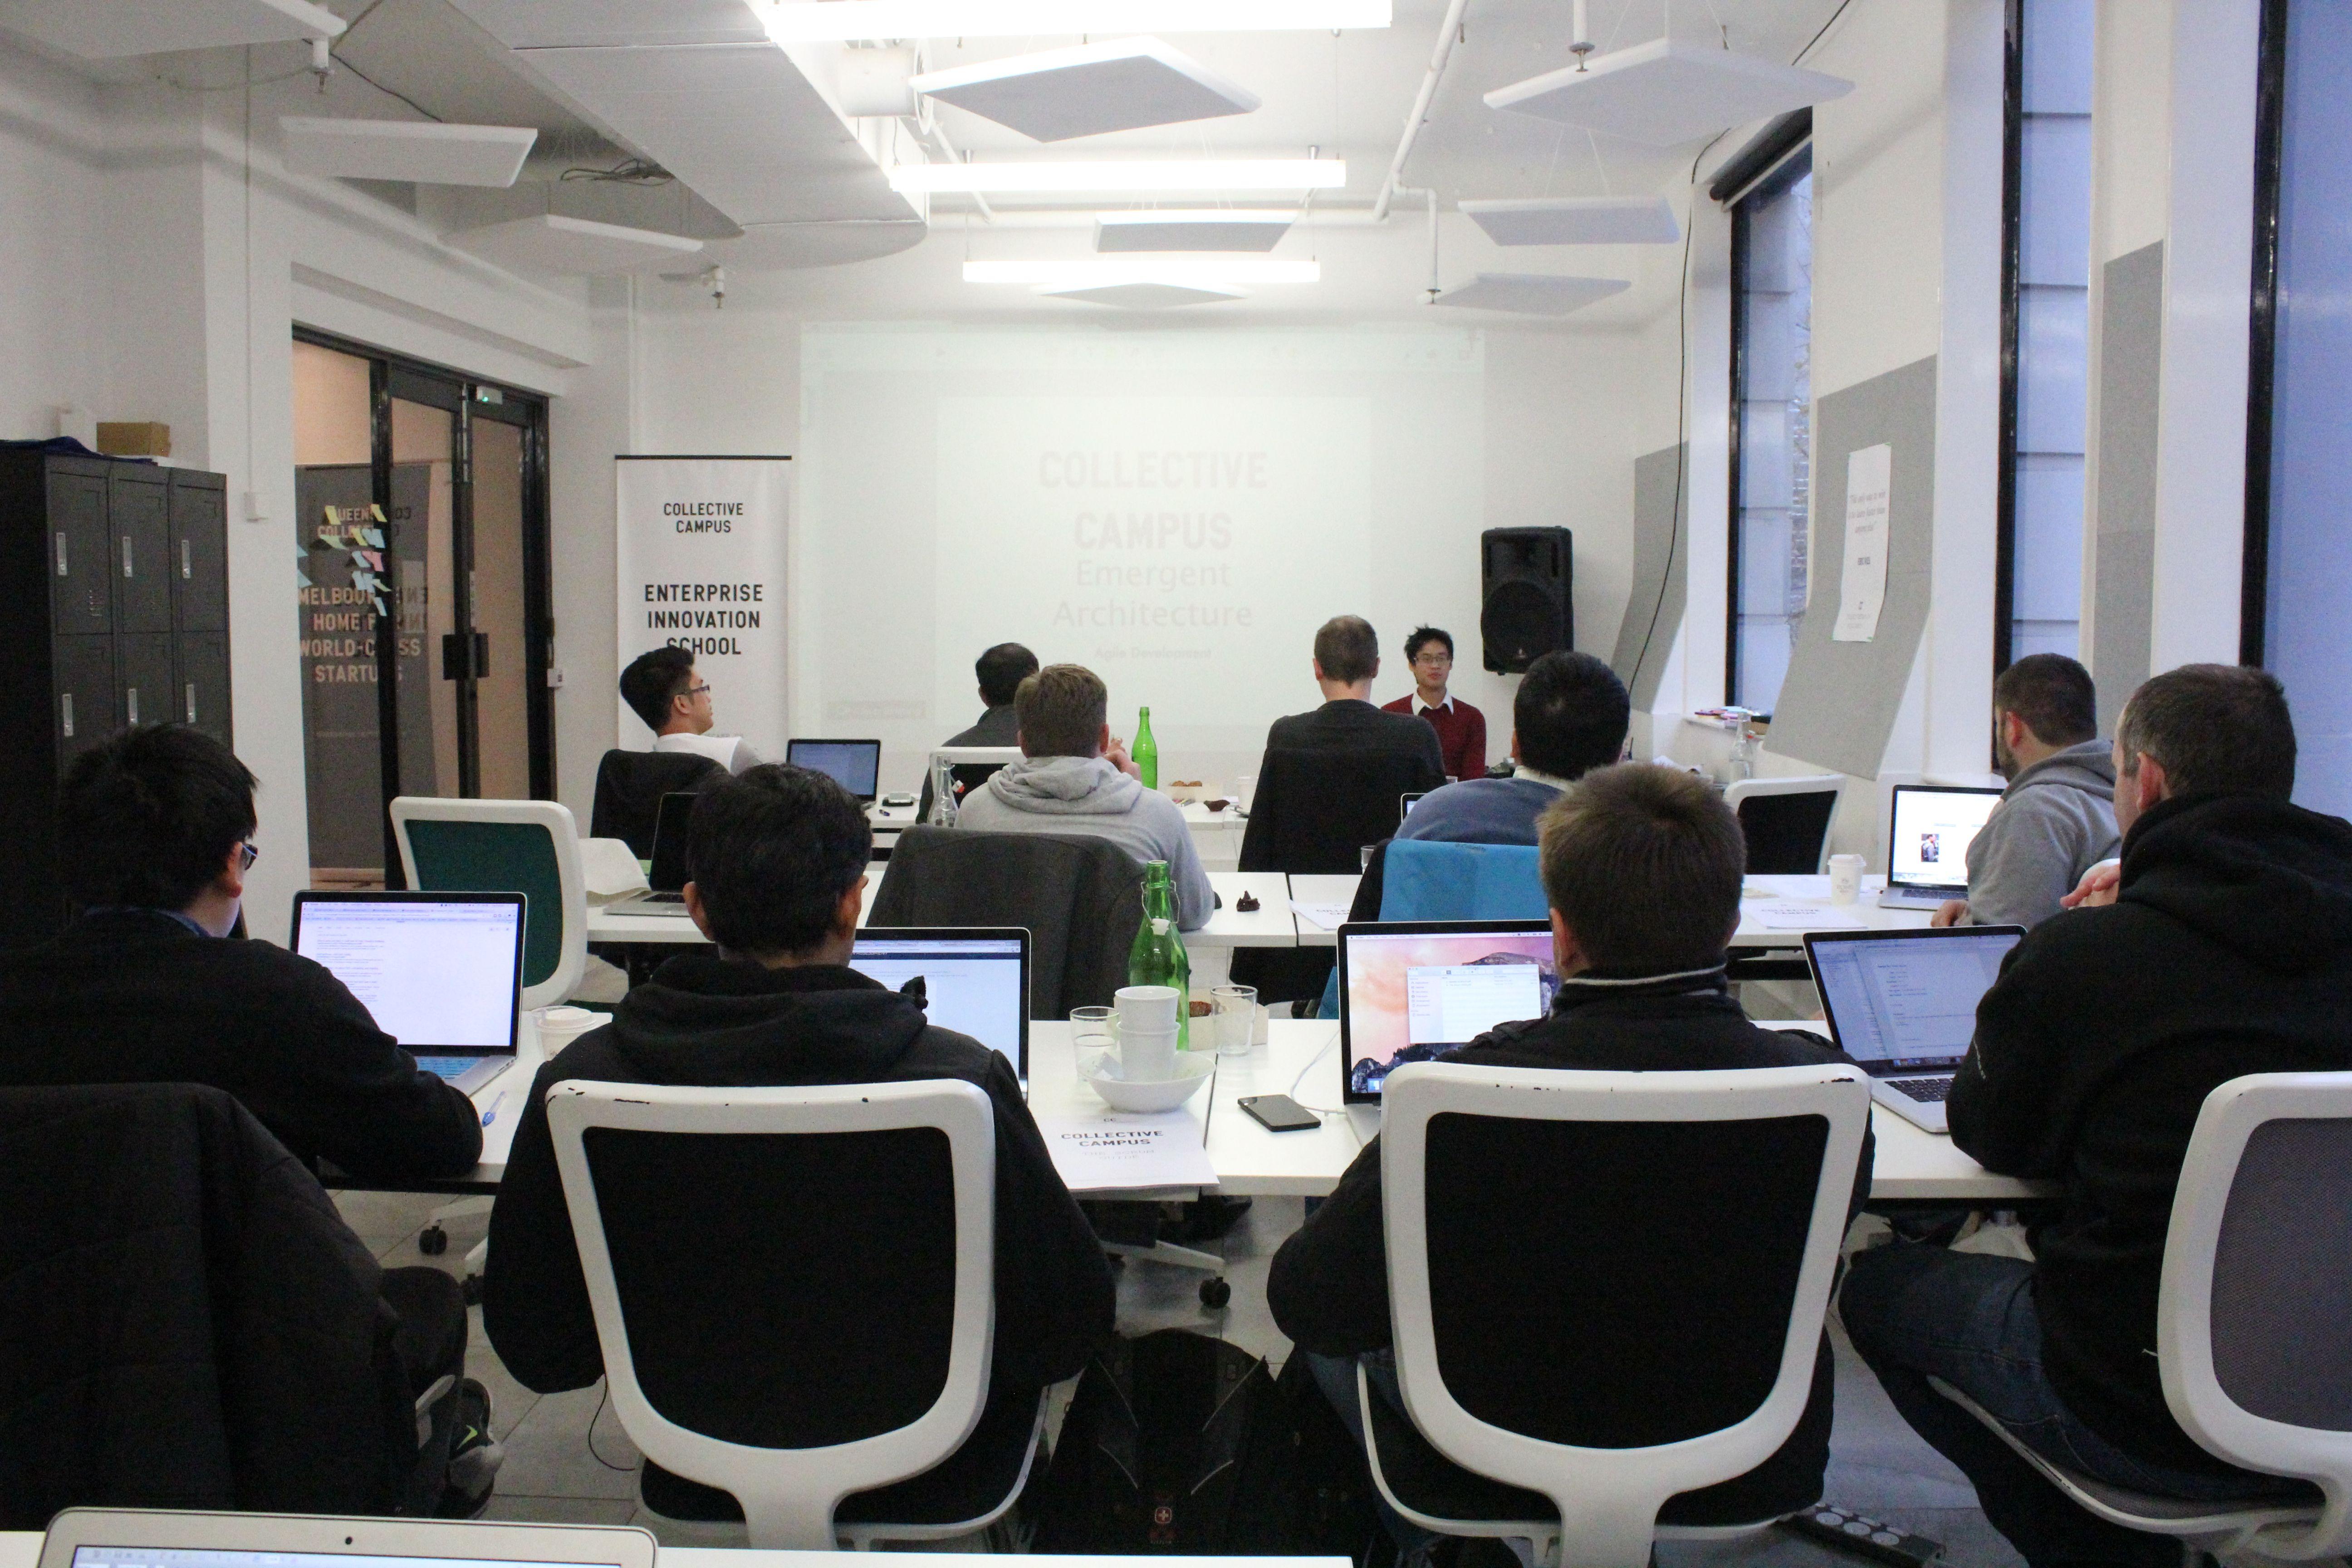 Delivered a 2 day Agile (SCRUM) workshop